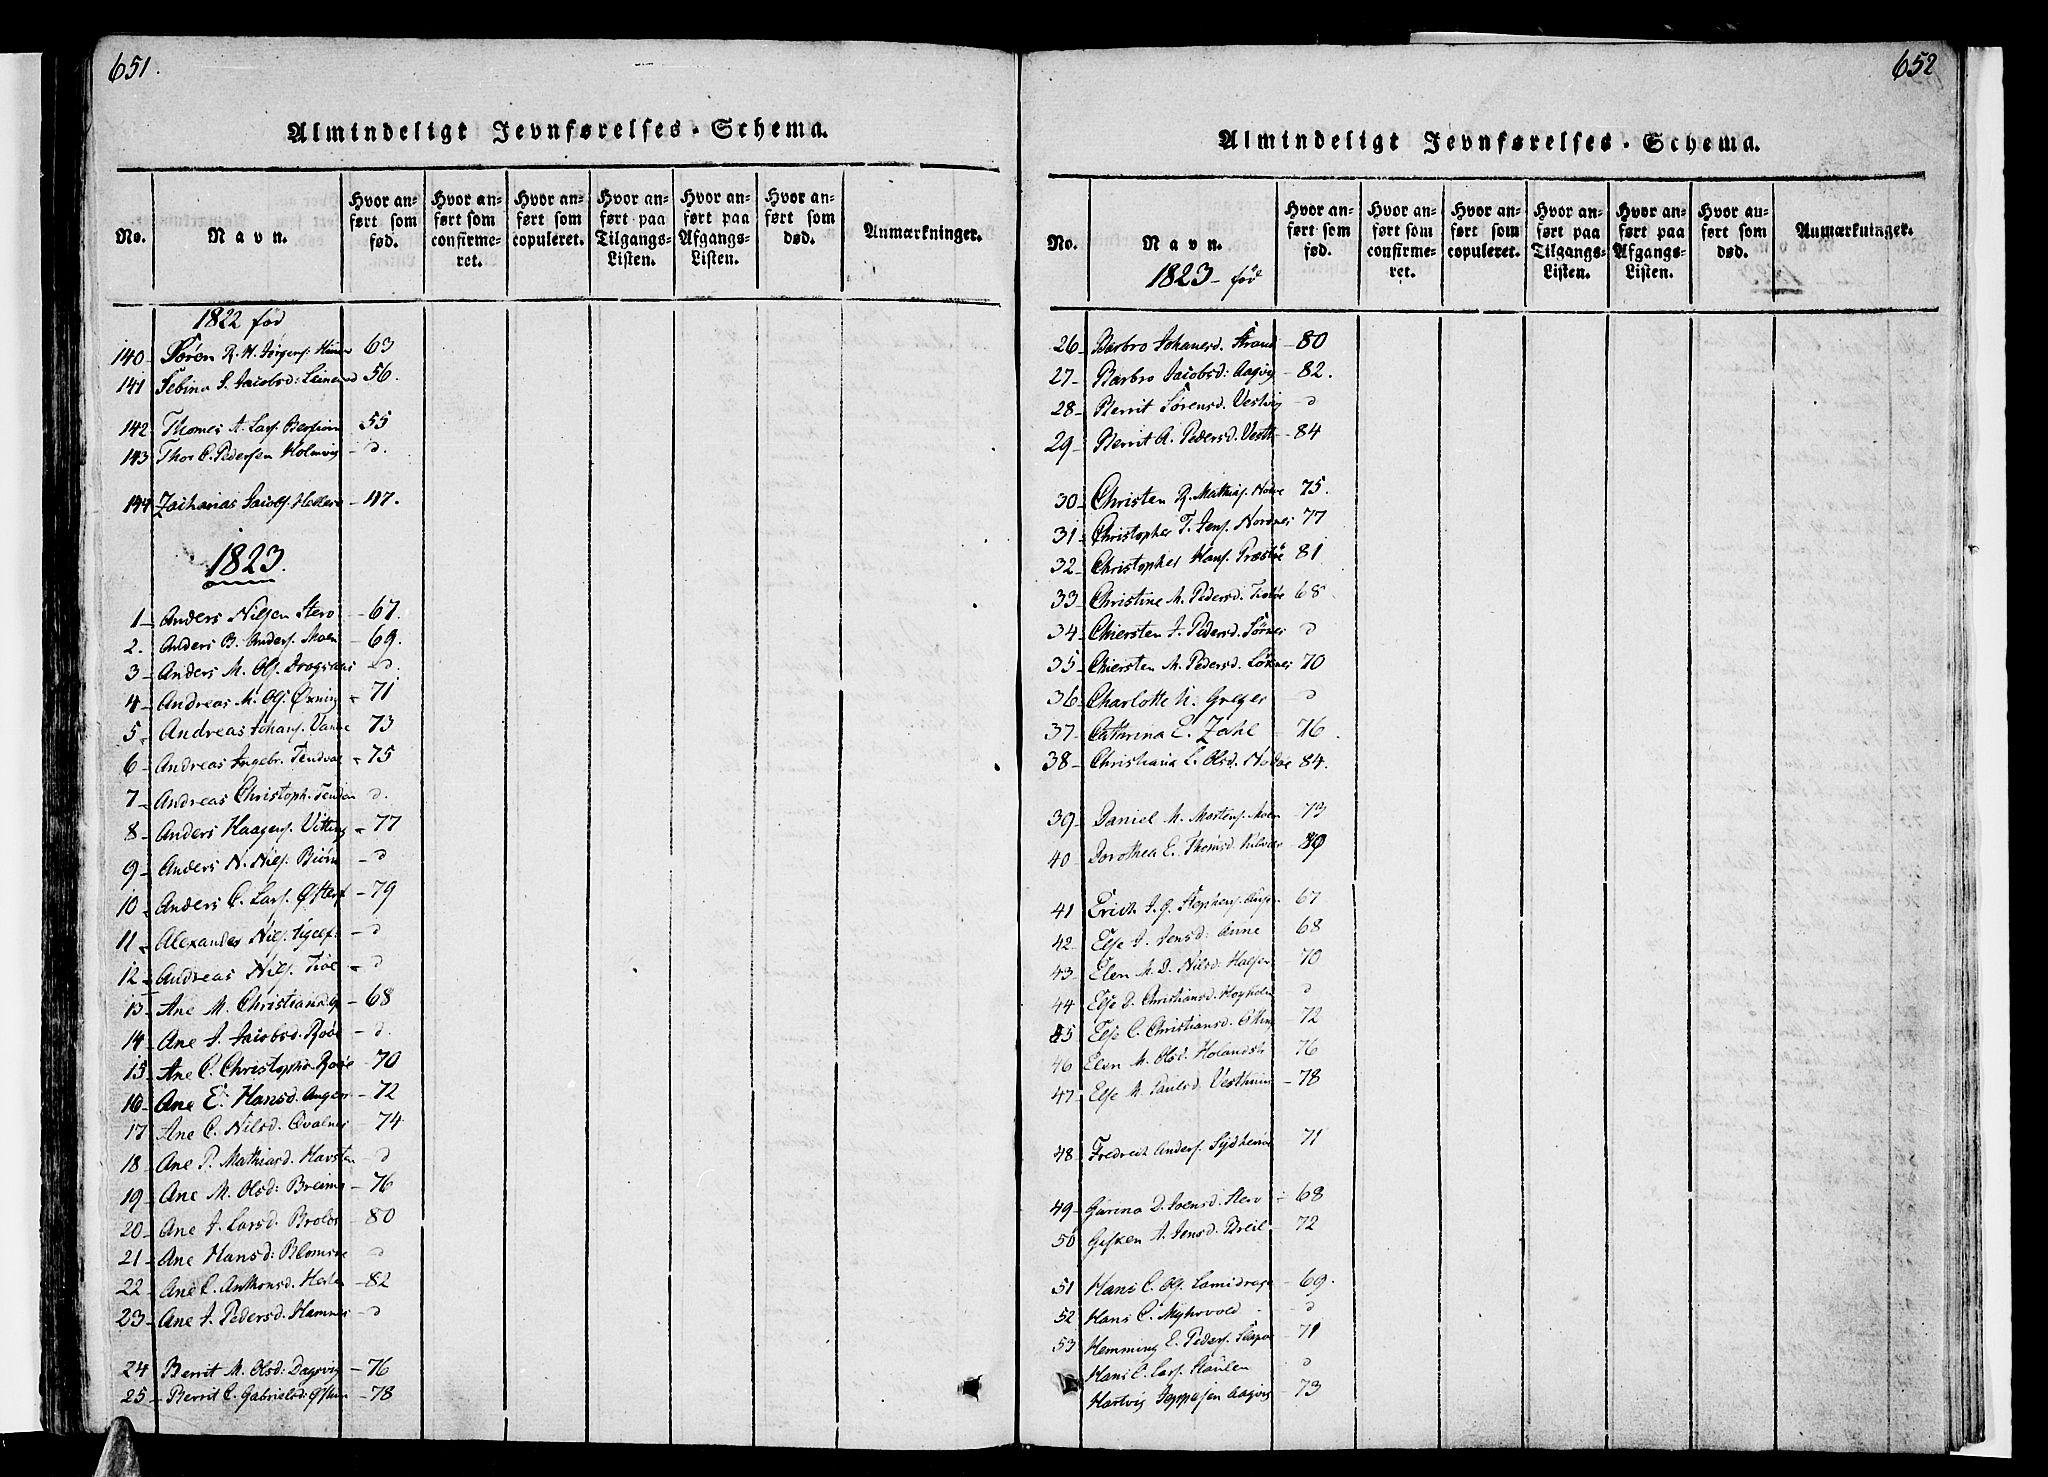 SAT, Ministerialprotokoller, klokkerbøker og fødselsregistre - Nordland, 830/L0445: Ministerialbok nr. 830A09, 1820-1830, s. 651-652